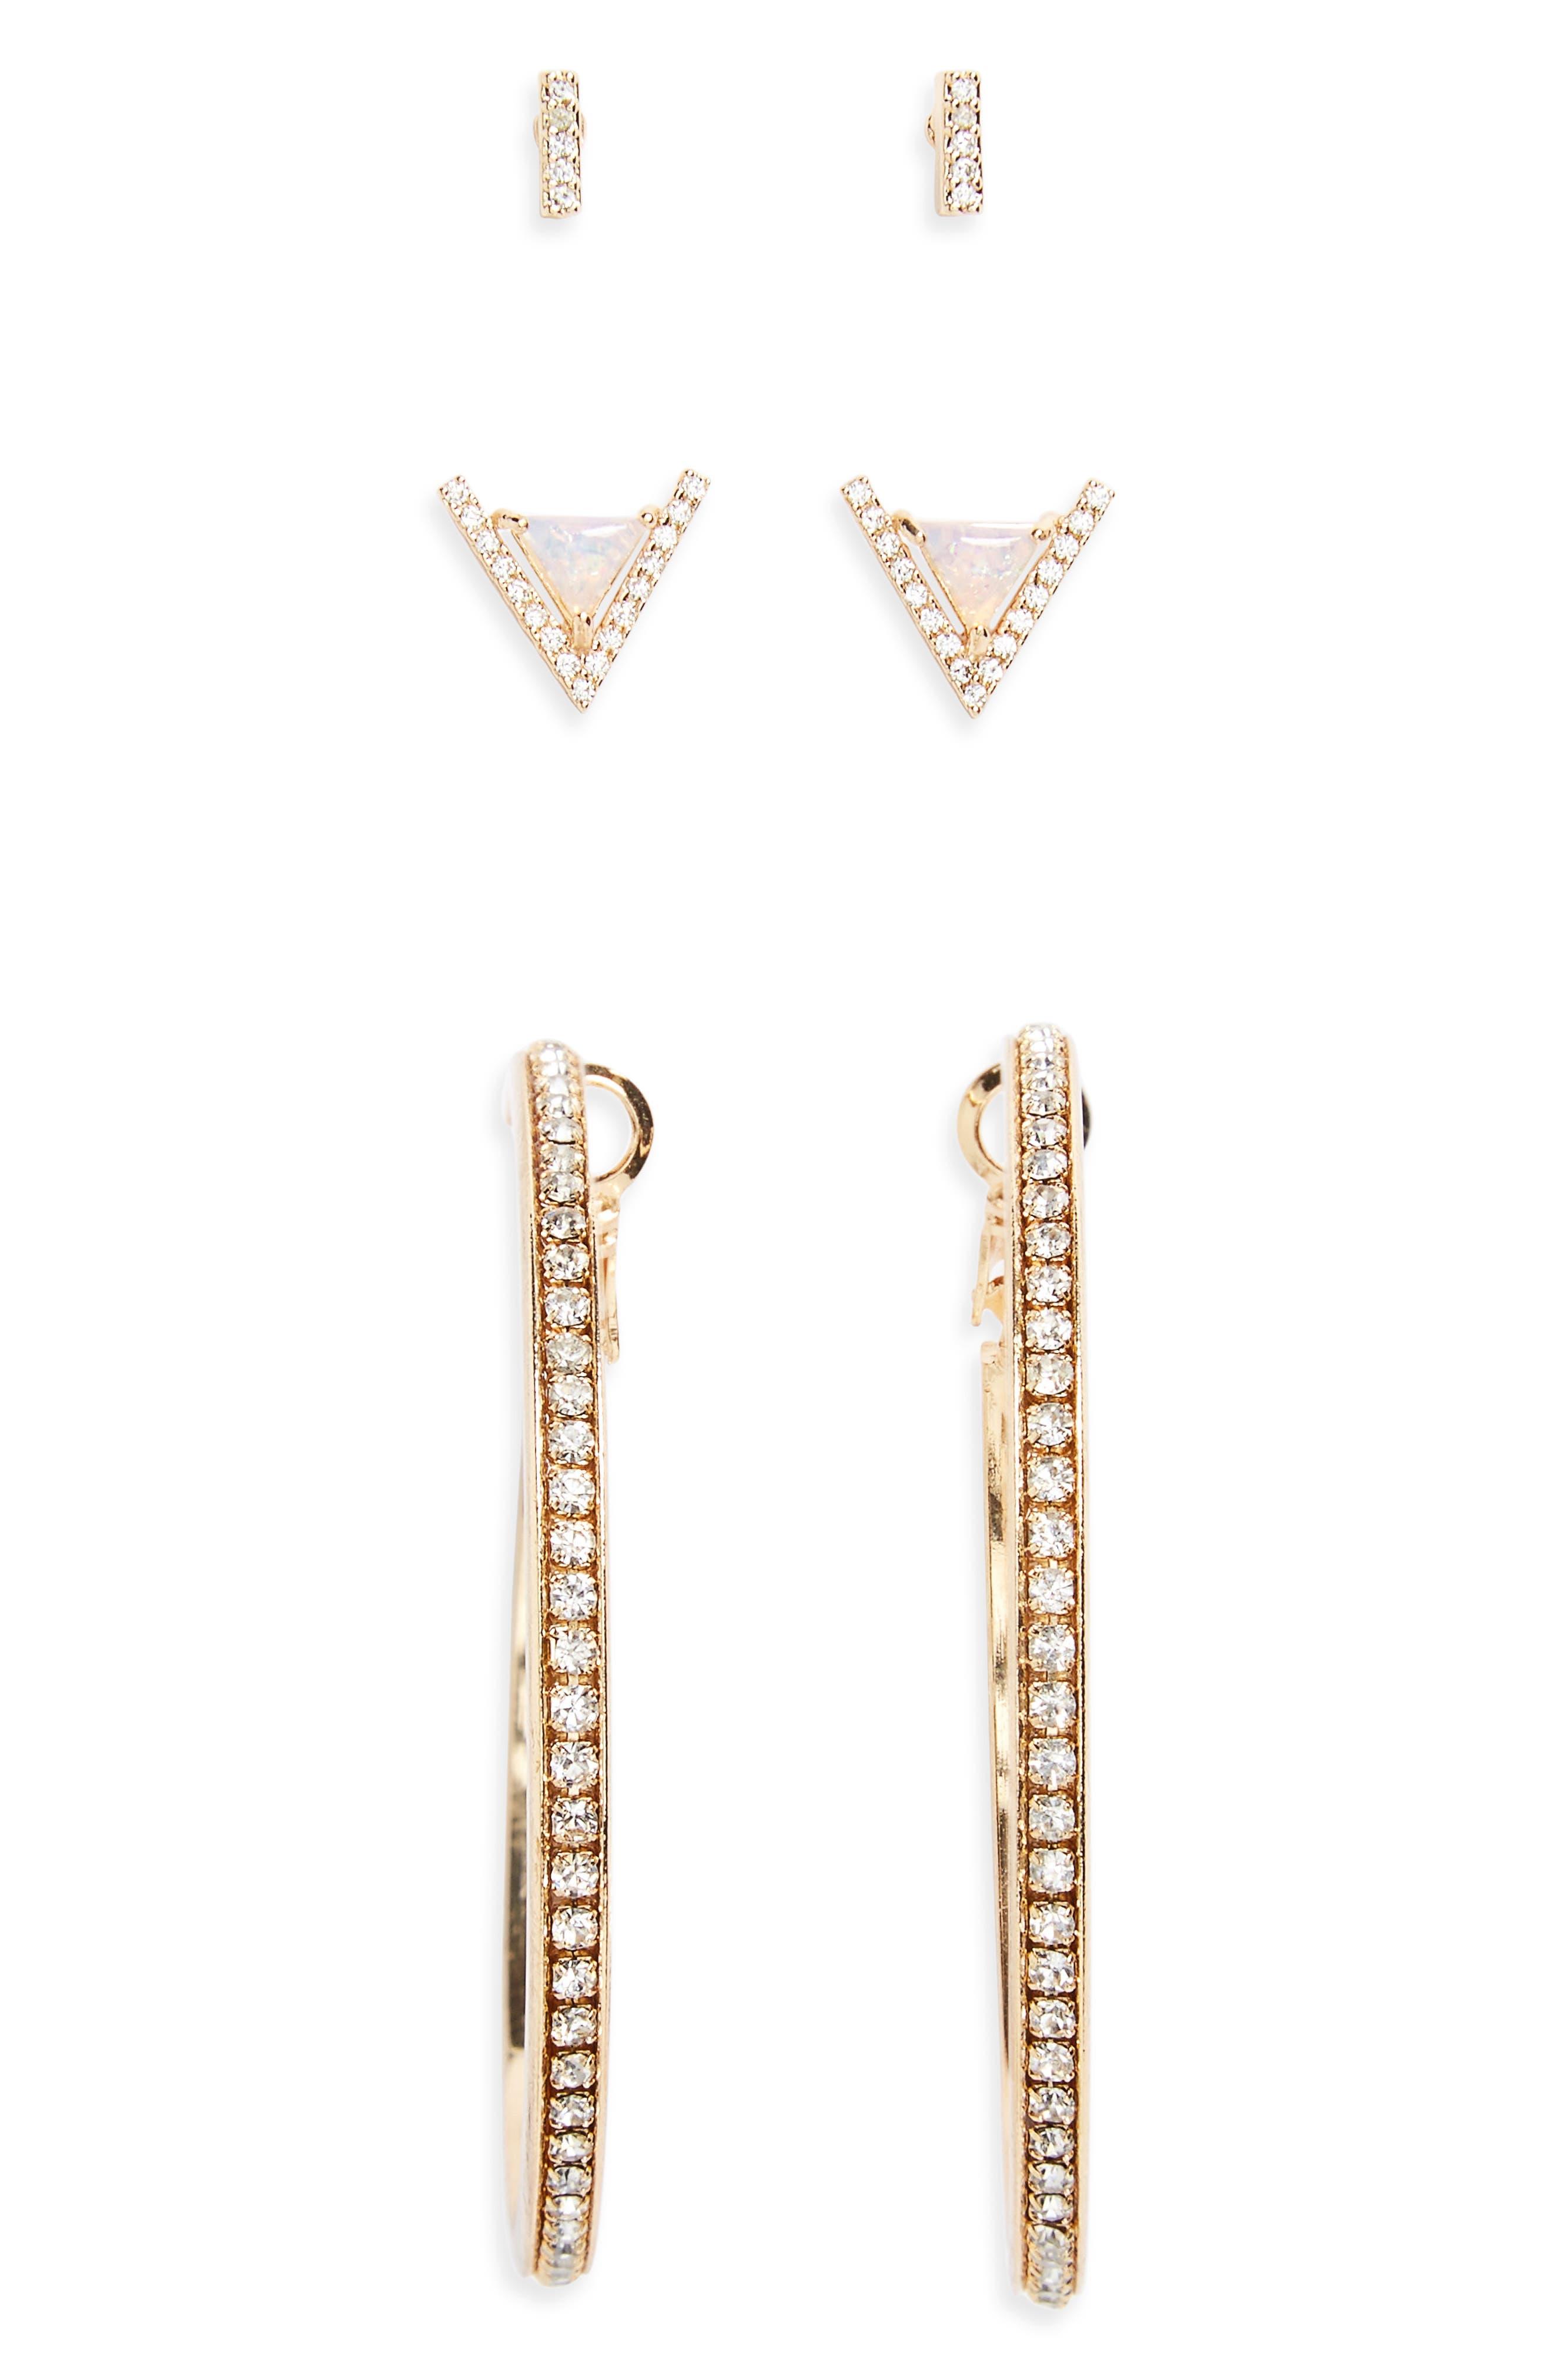 Crystal & Faux Opal 3-Pack Earrings,                         Main,                         color,